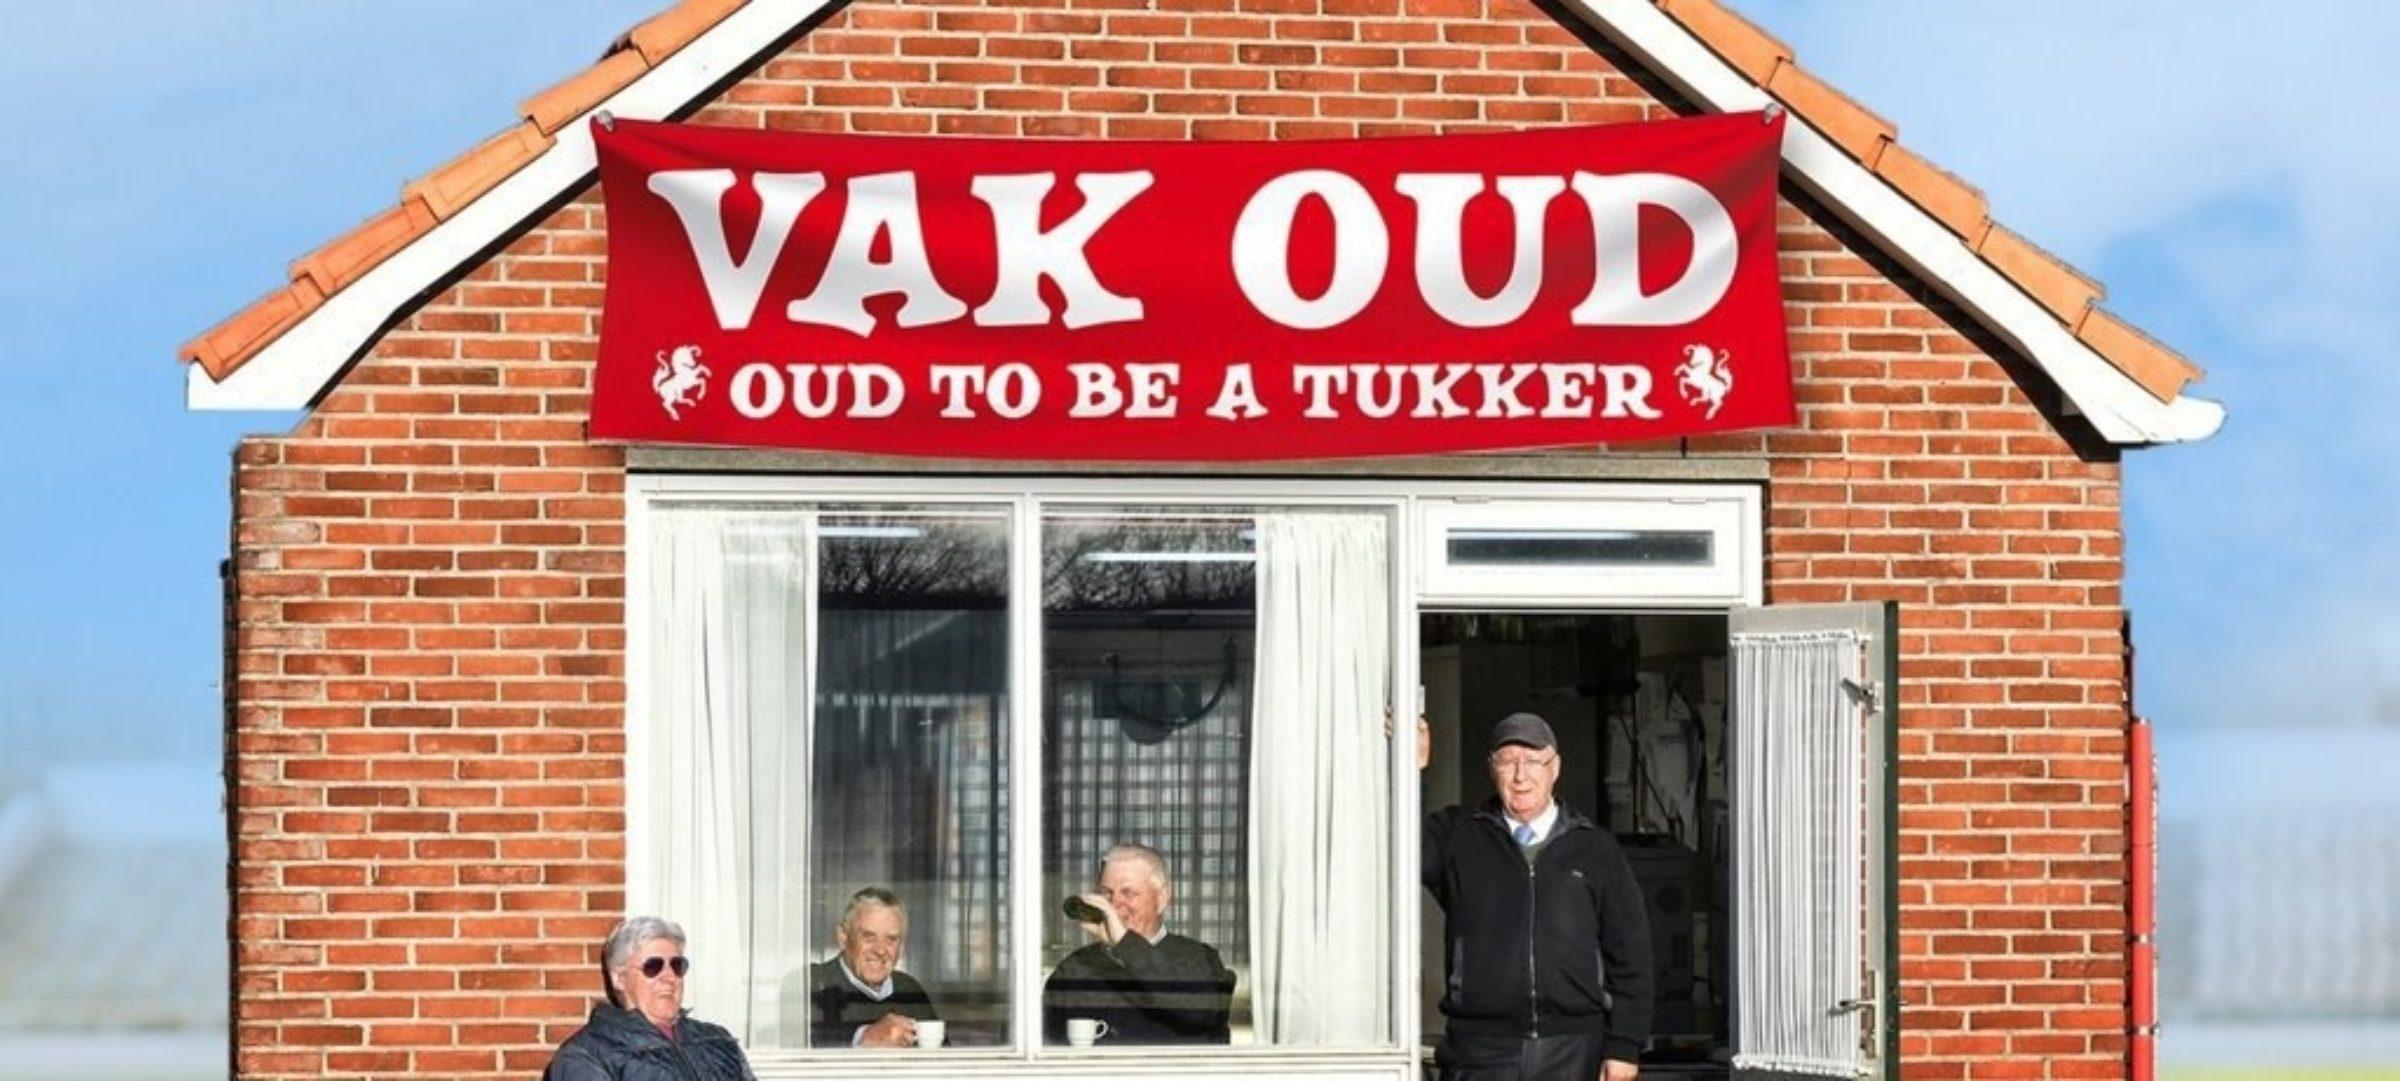 Vak Oud 2486 1553249696 35hxeiprz7